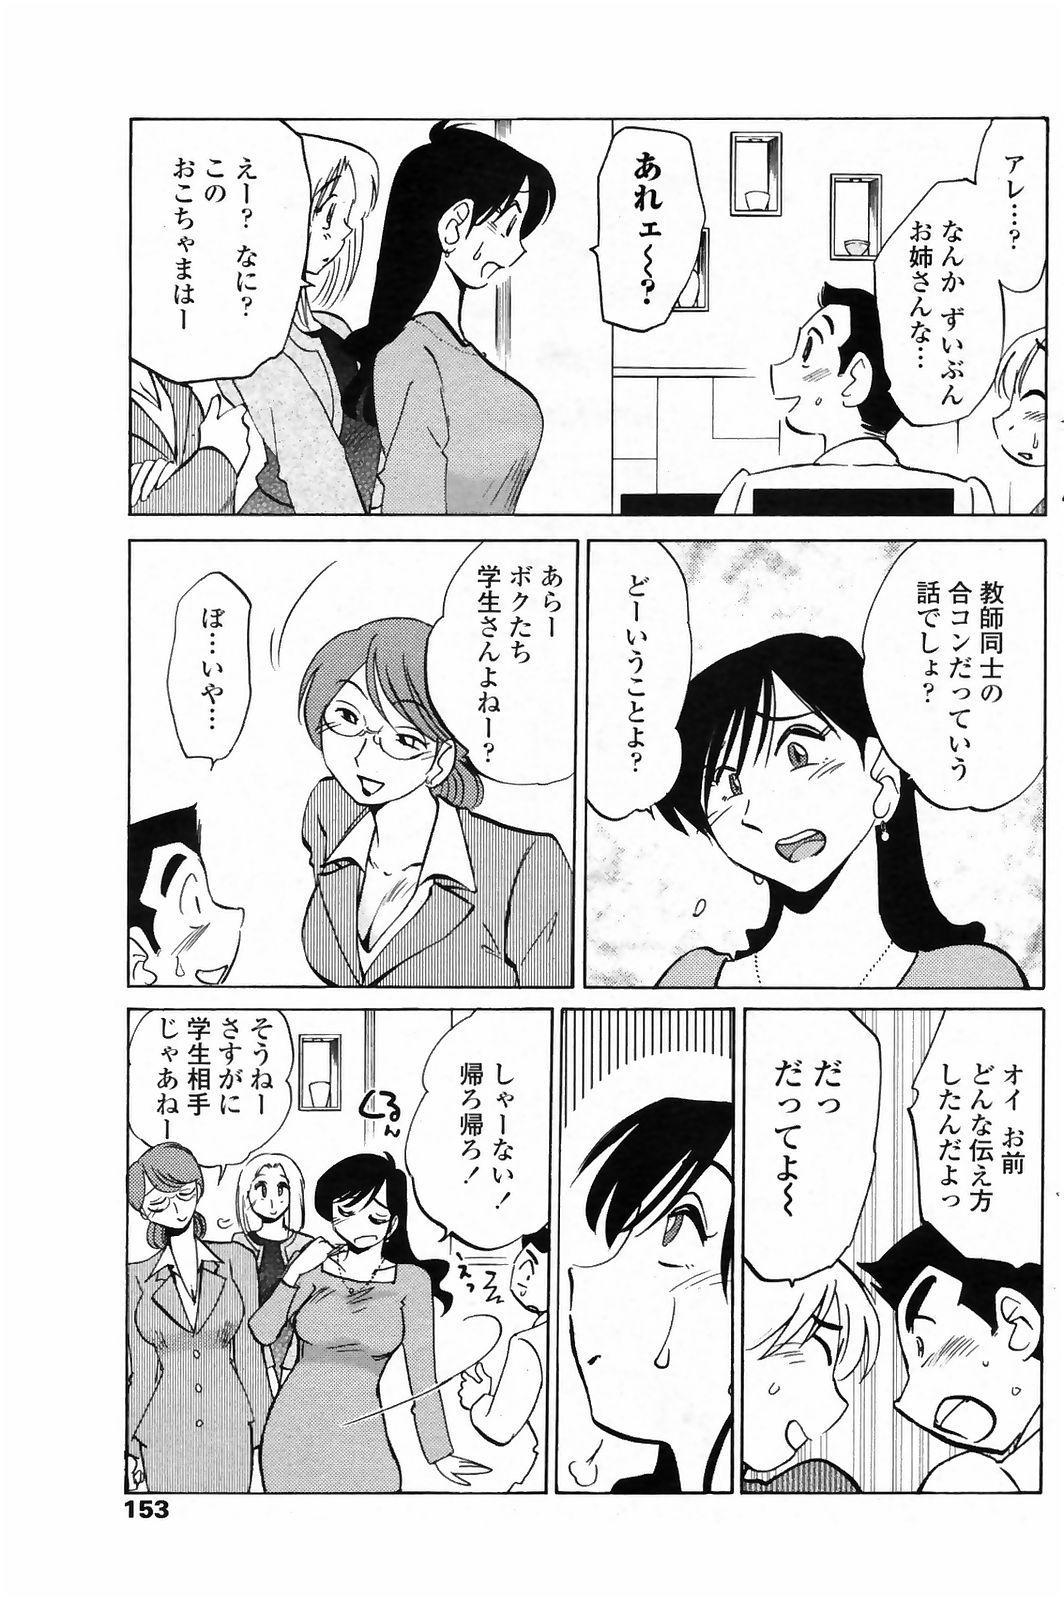 [Tsuyatsuya] Azumi-kun to Issho chapt.1-5 (Comic Penguin Club) 65